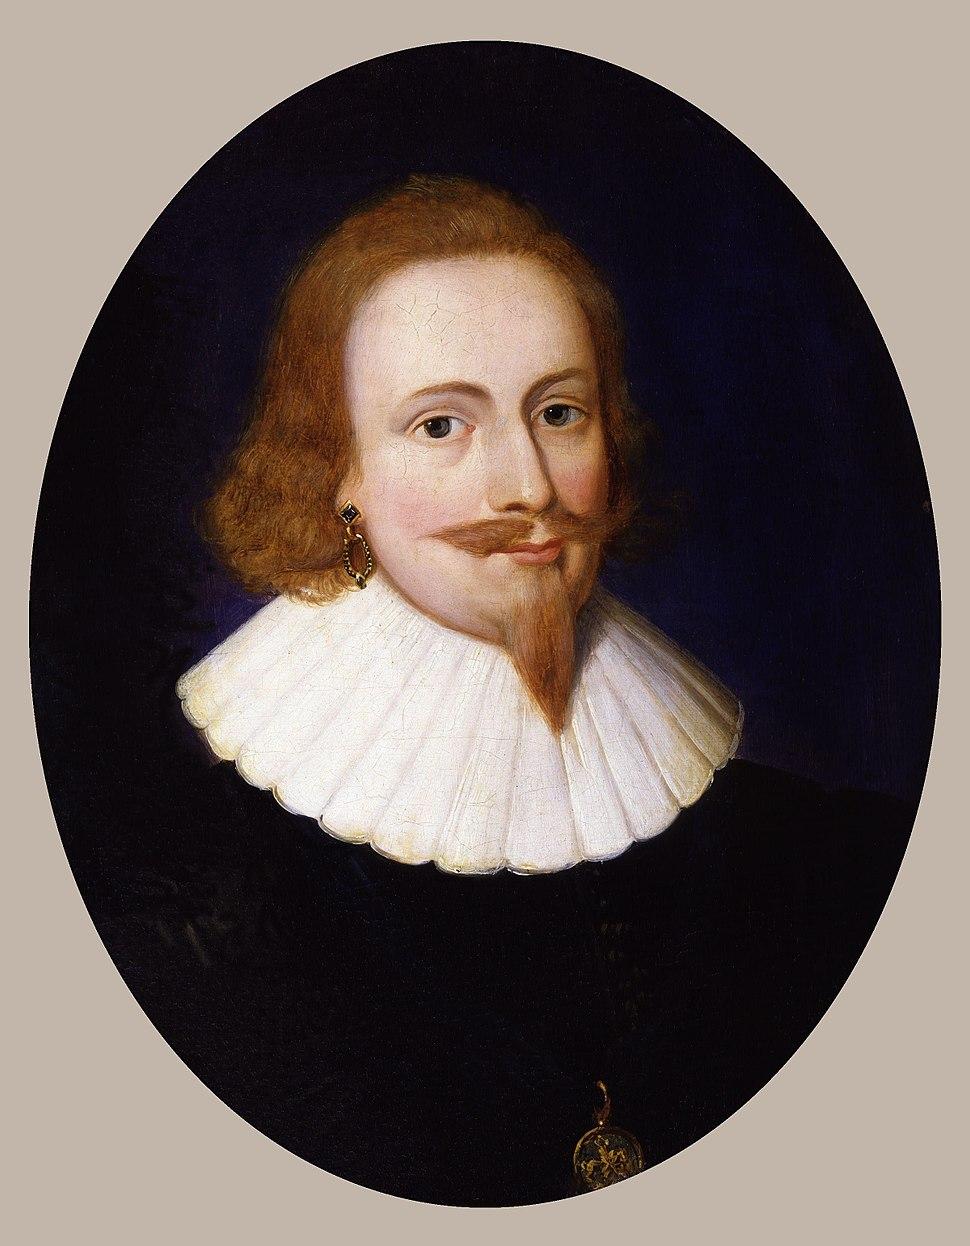 Robert Carr, Earl of Somerset by John Hoskins